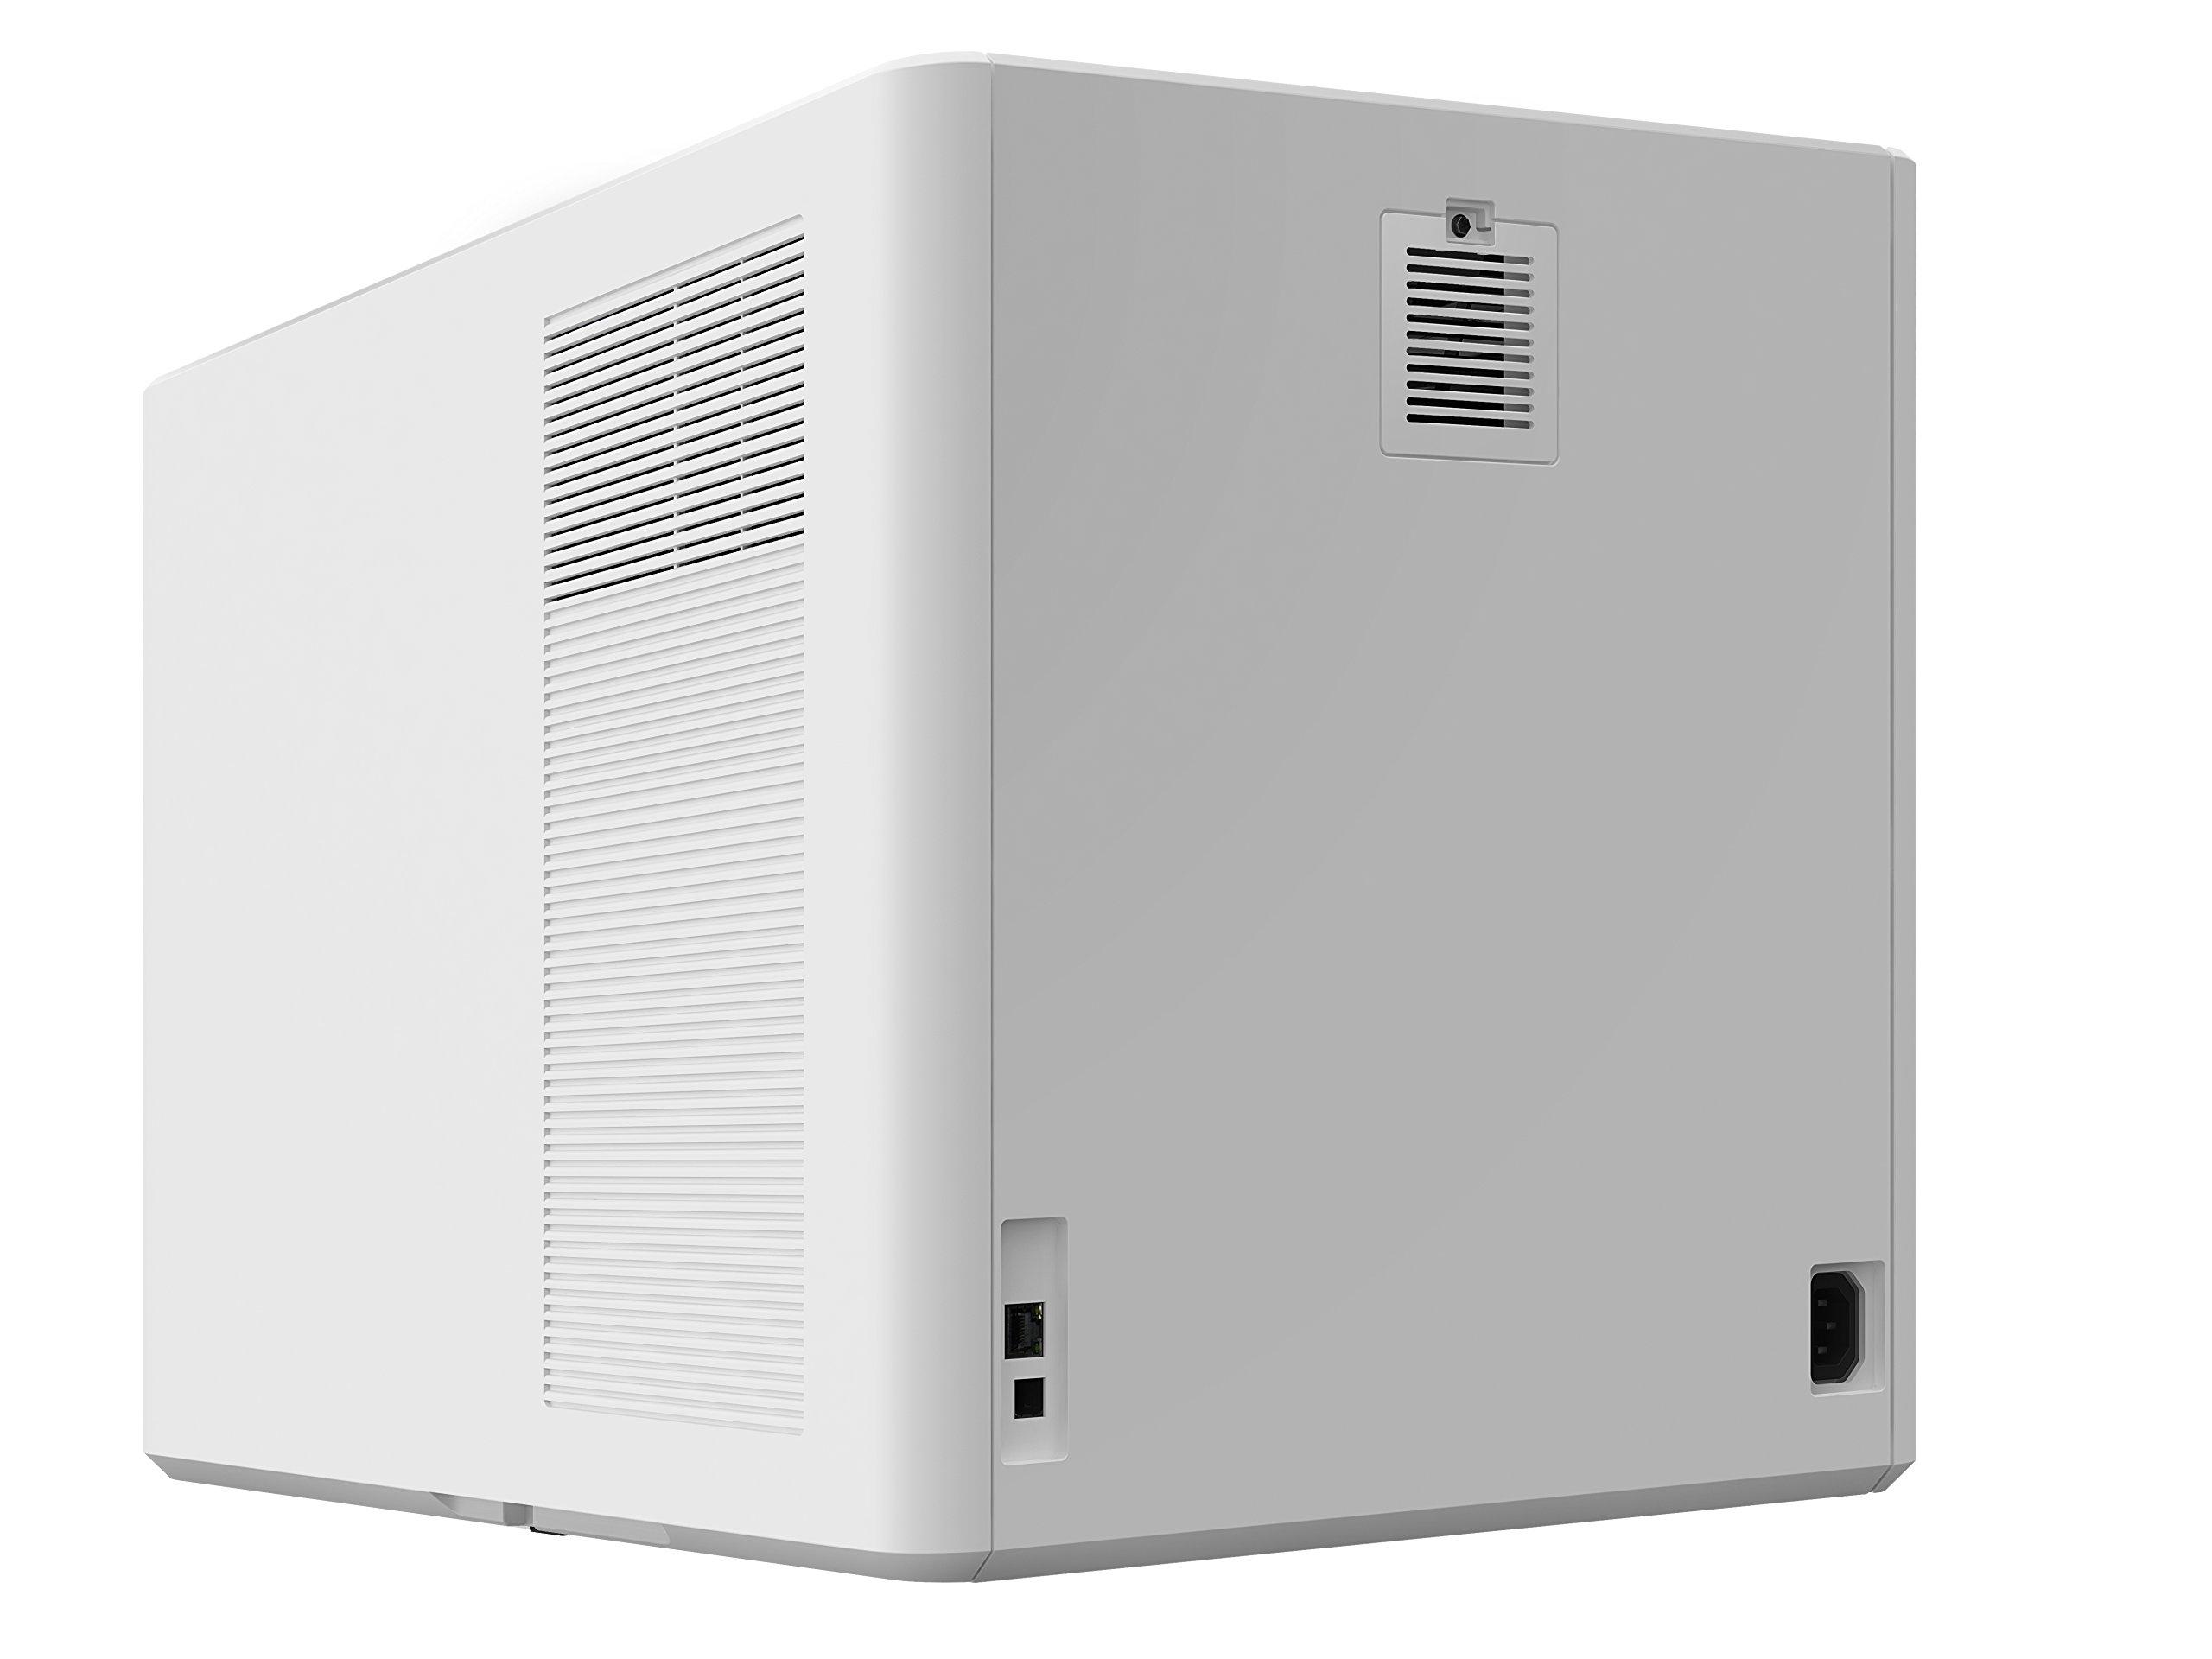 Sindoh 3DWOX 1 3D Printer (New Model - 3D1AQ)